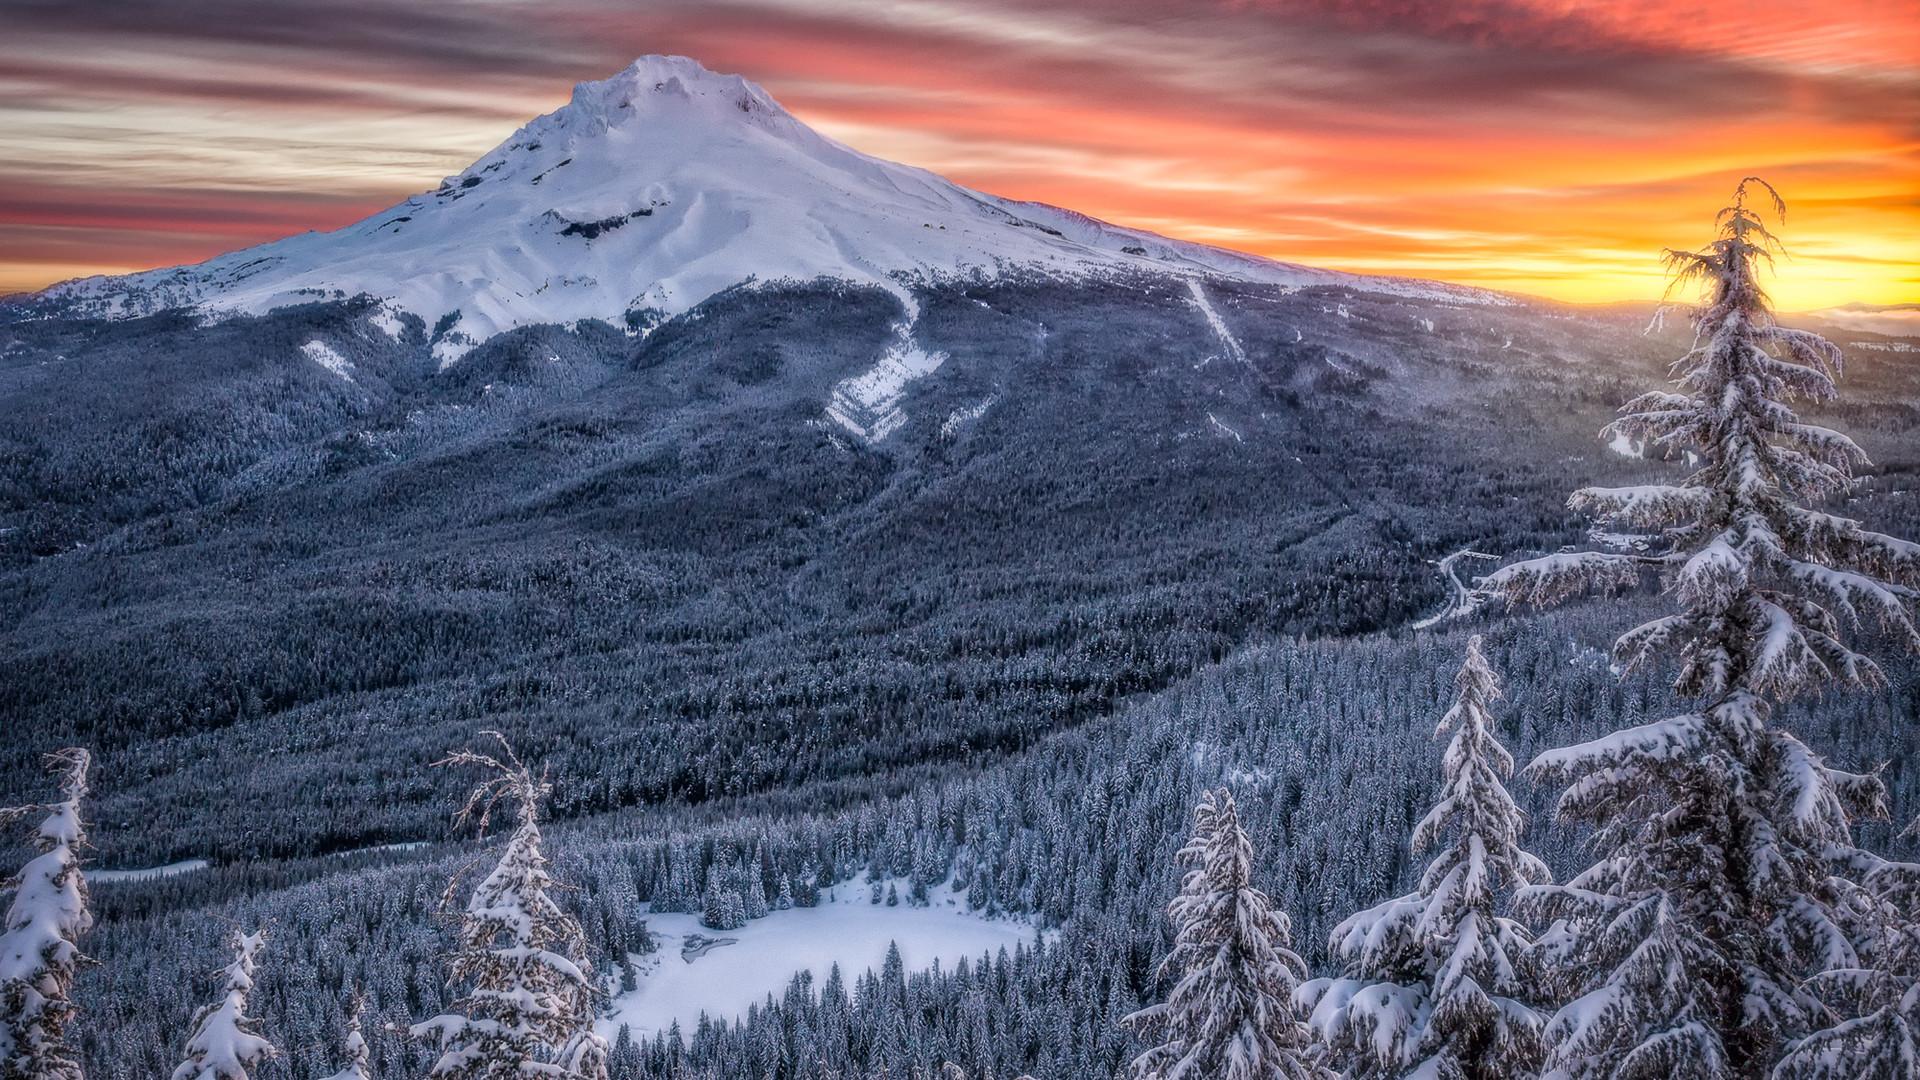 Midwinter's Sunrise Over Mt. Hood